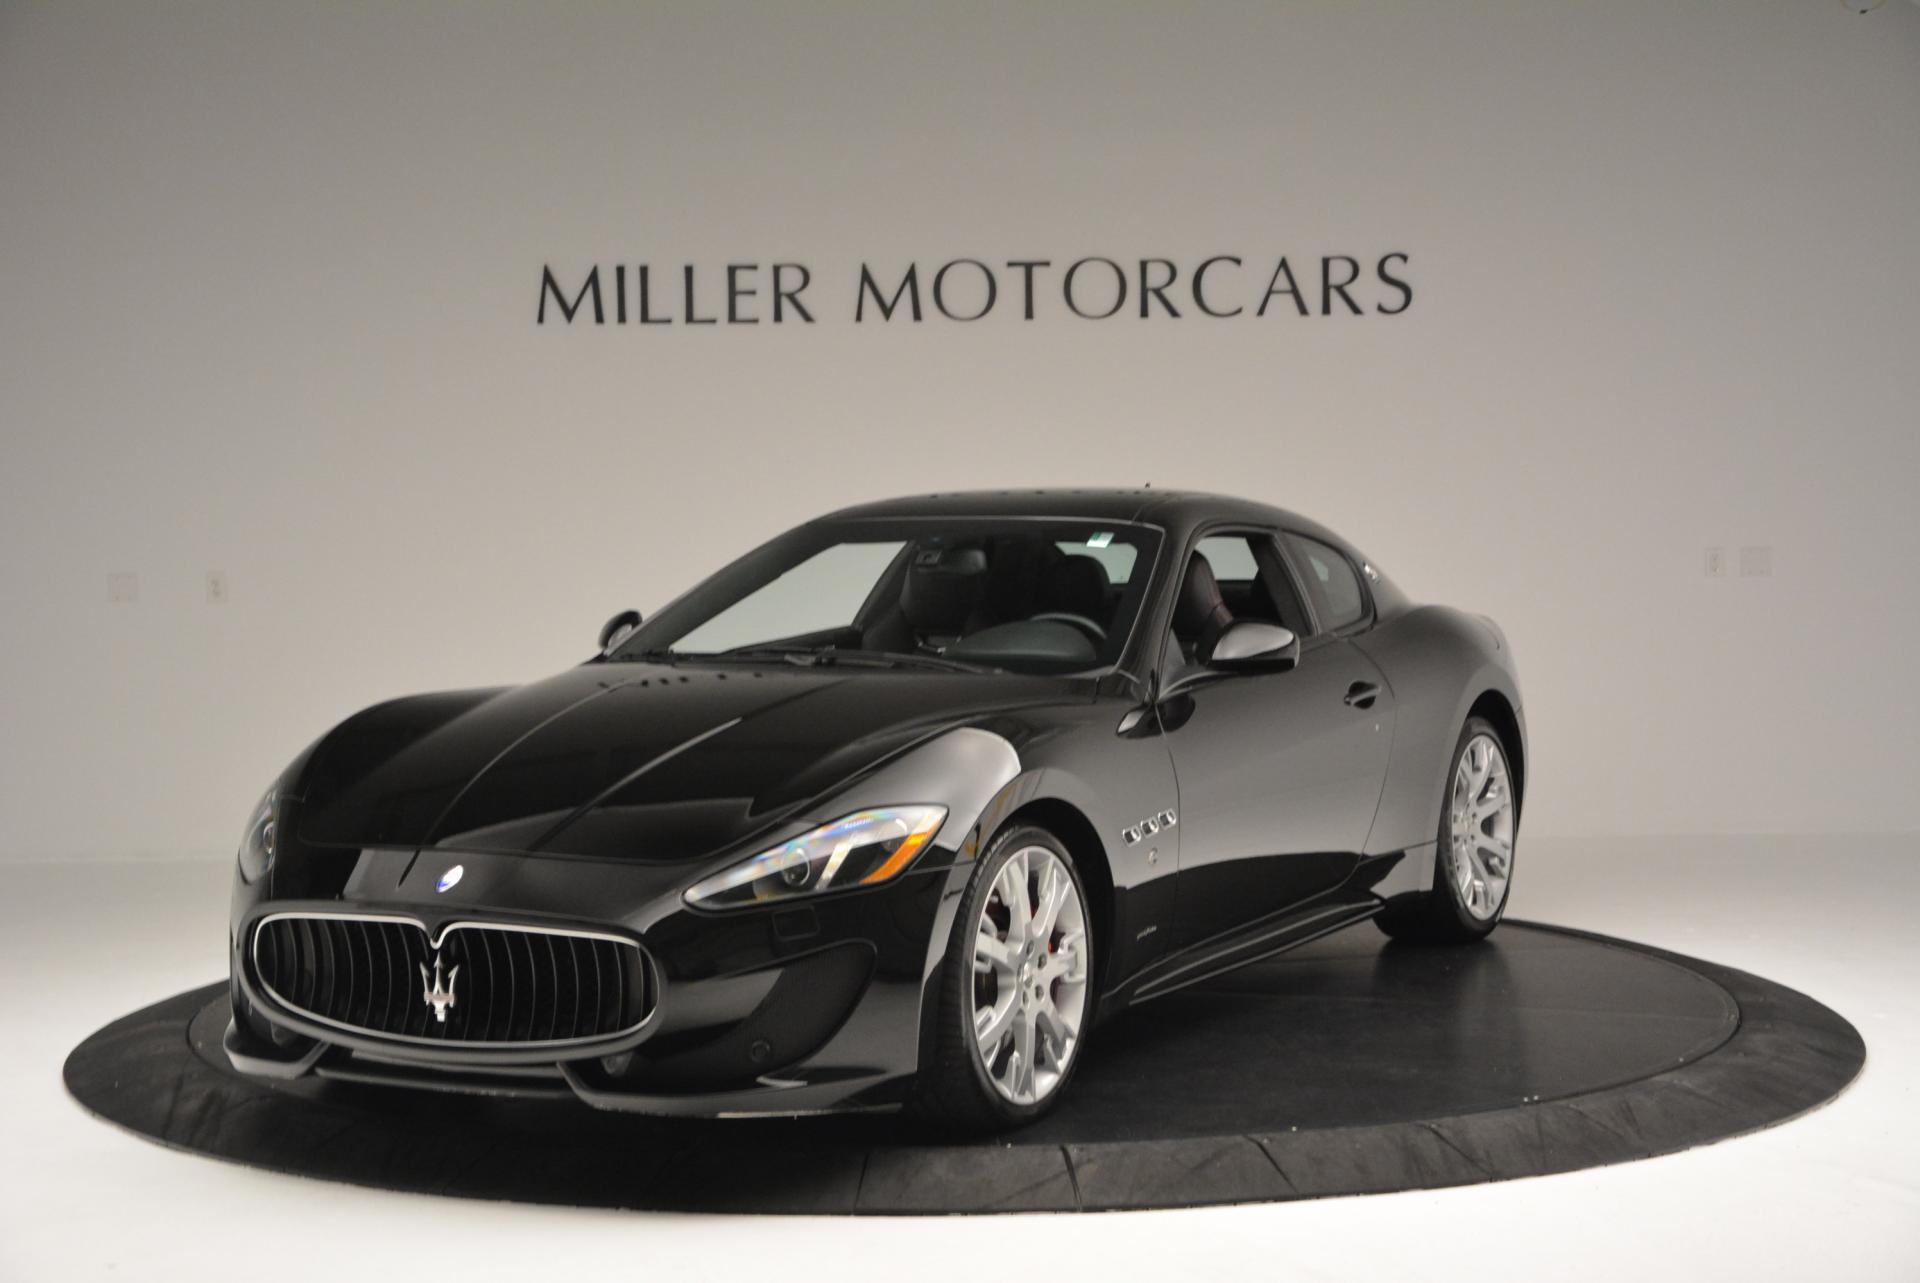 Used 2013 Maserati GranTurismo Sport for sale Sold at McLaren Greenwich in Greenwich CT 06830 1